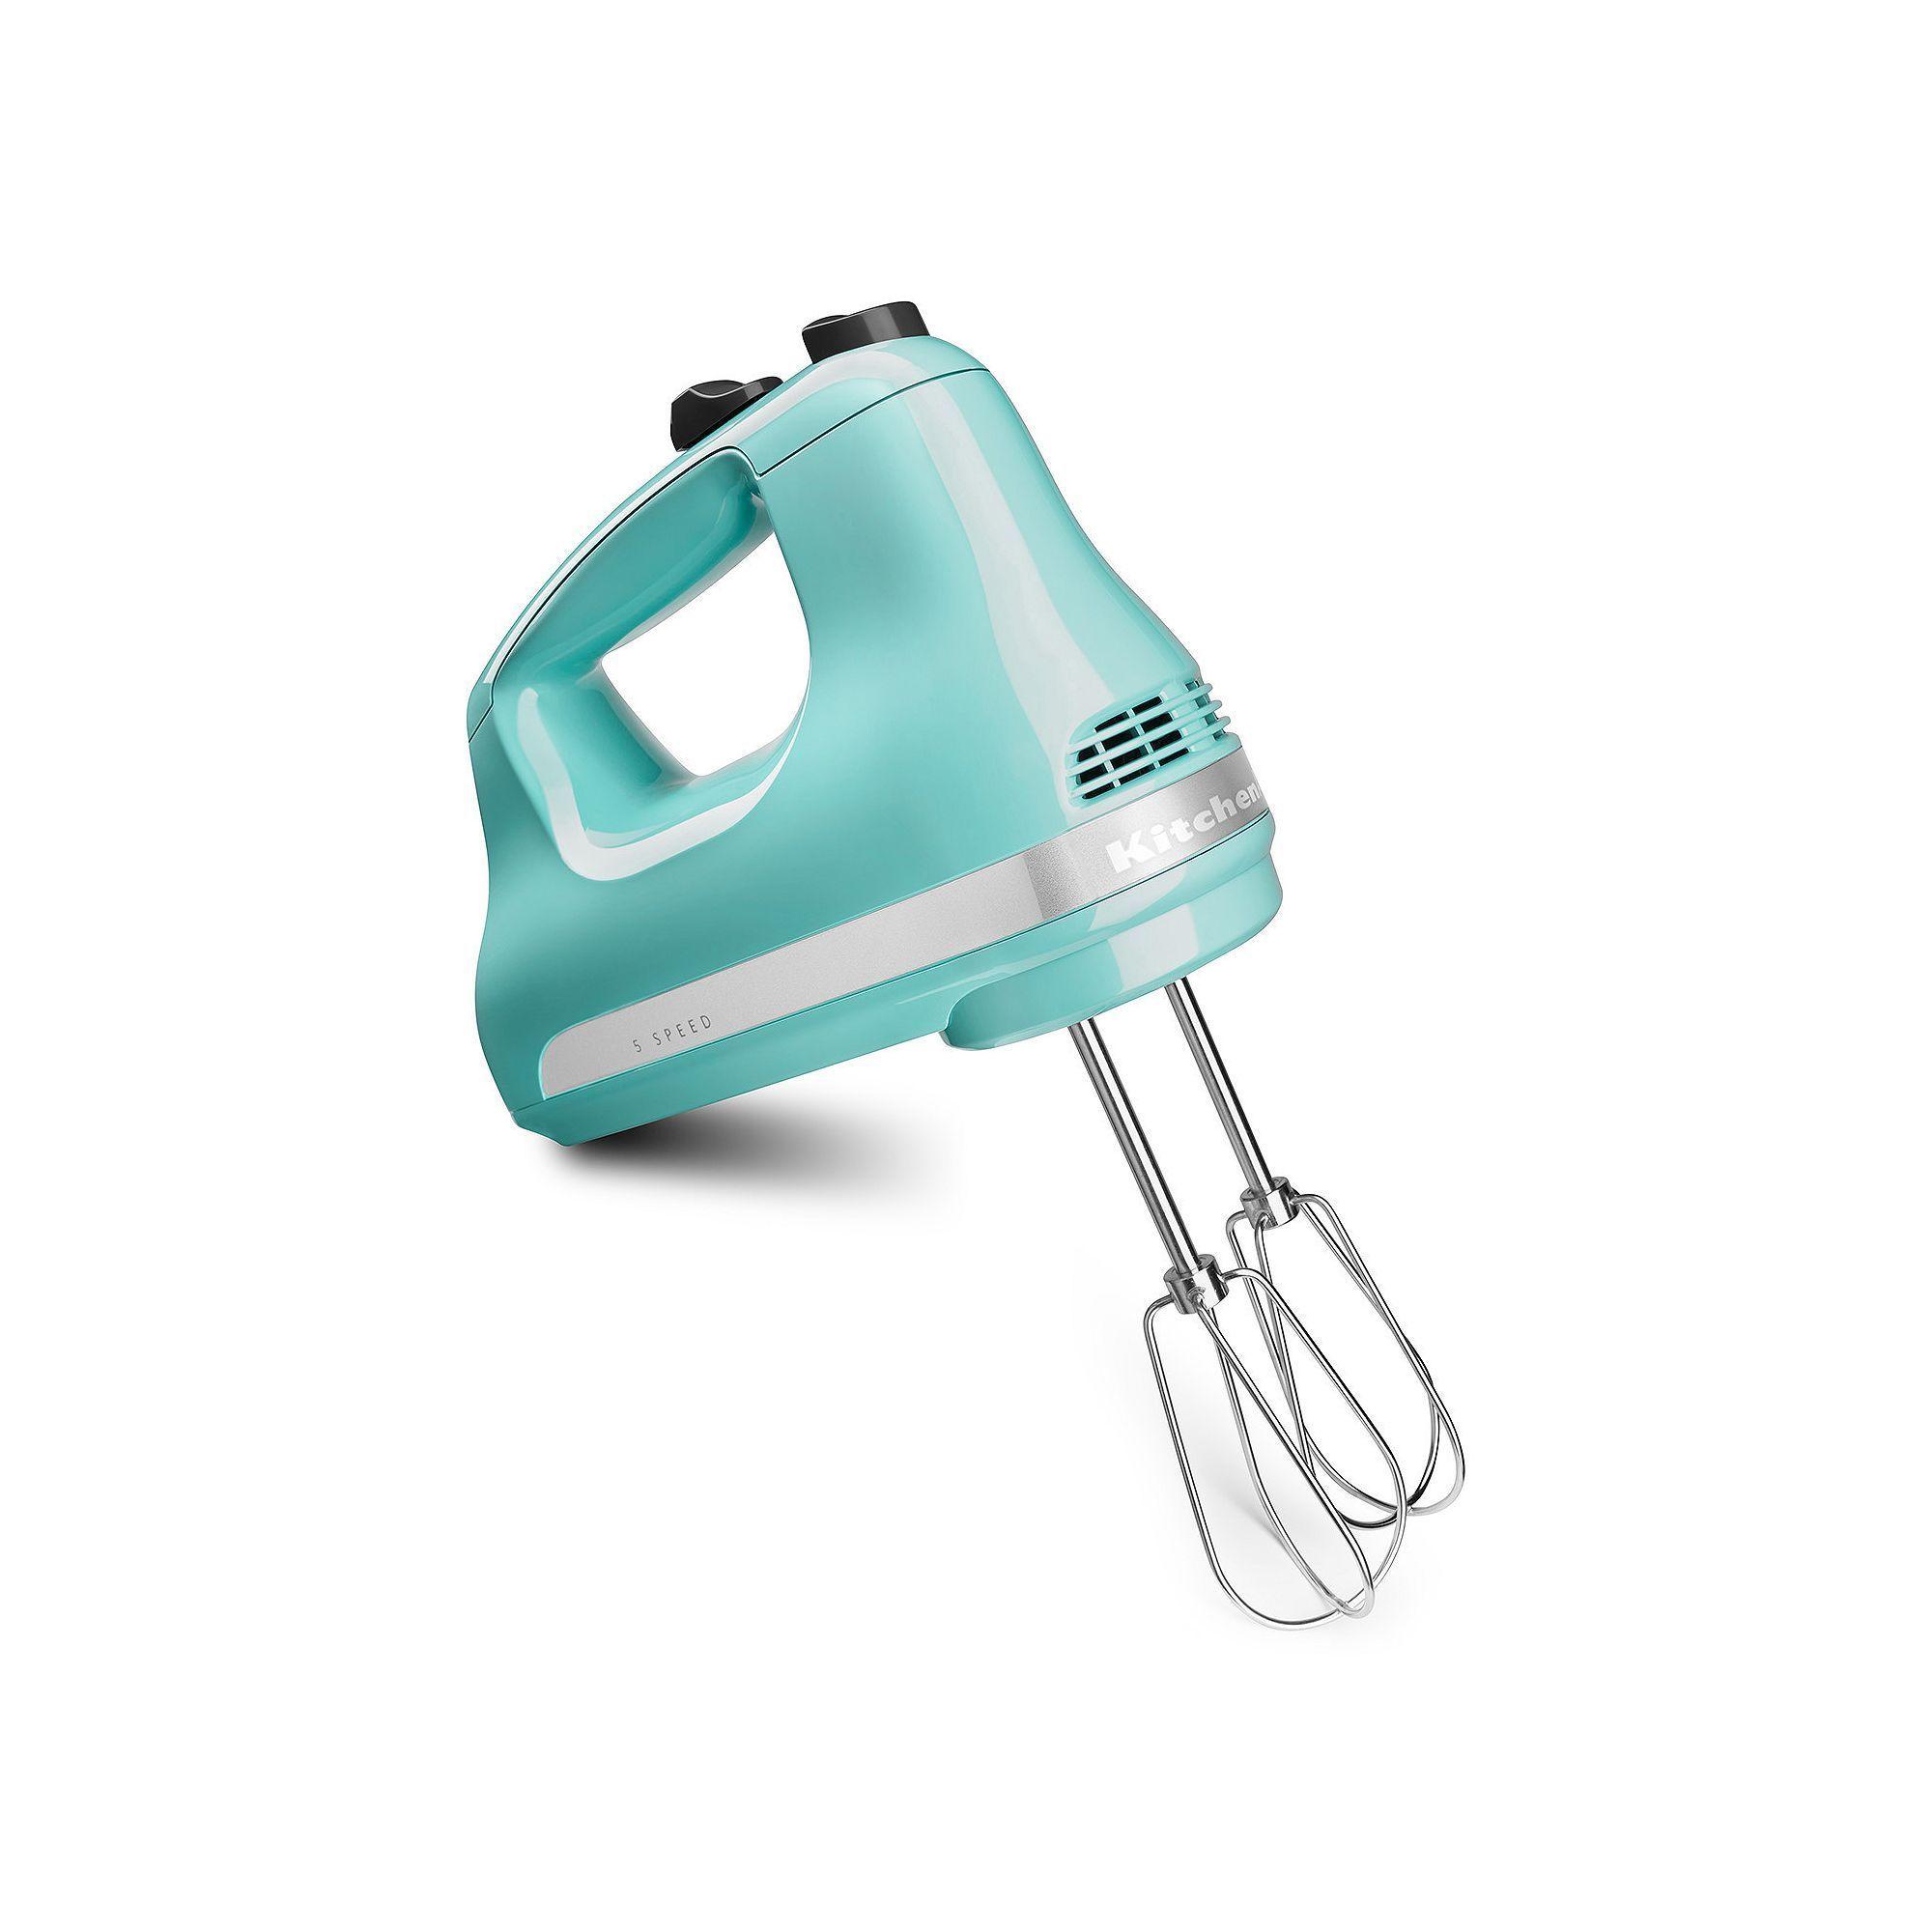 Kitchenaid khm512 5speed ultra power hand mixer